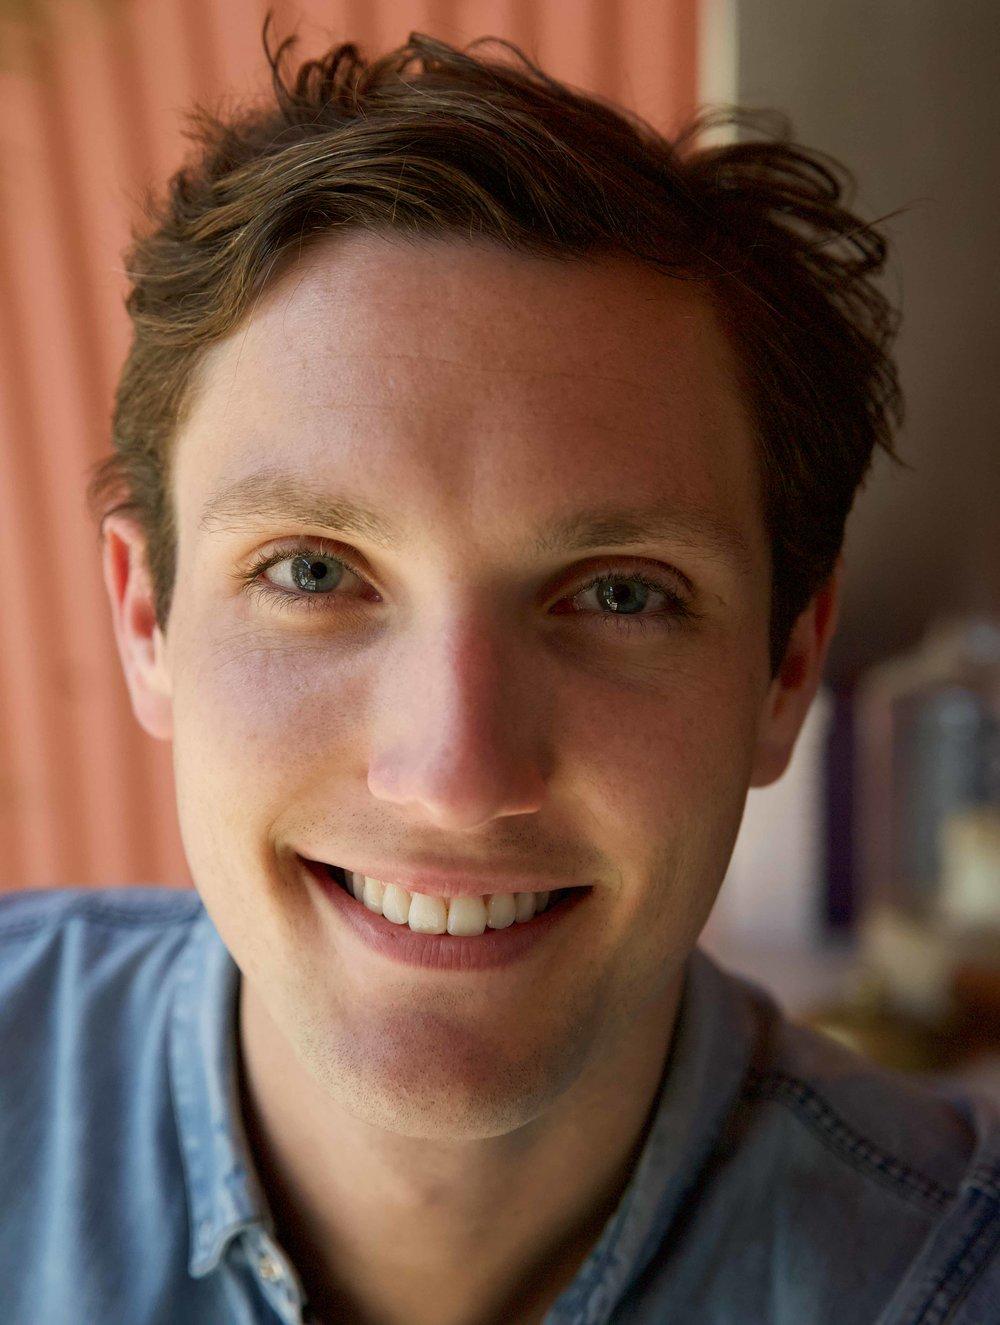 Partner, Rik Campbell